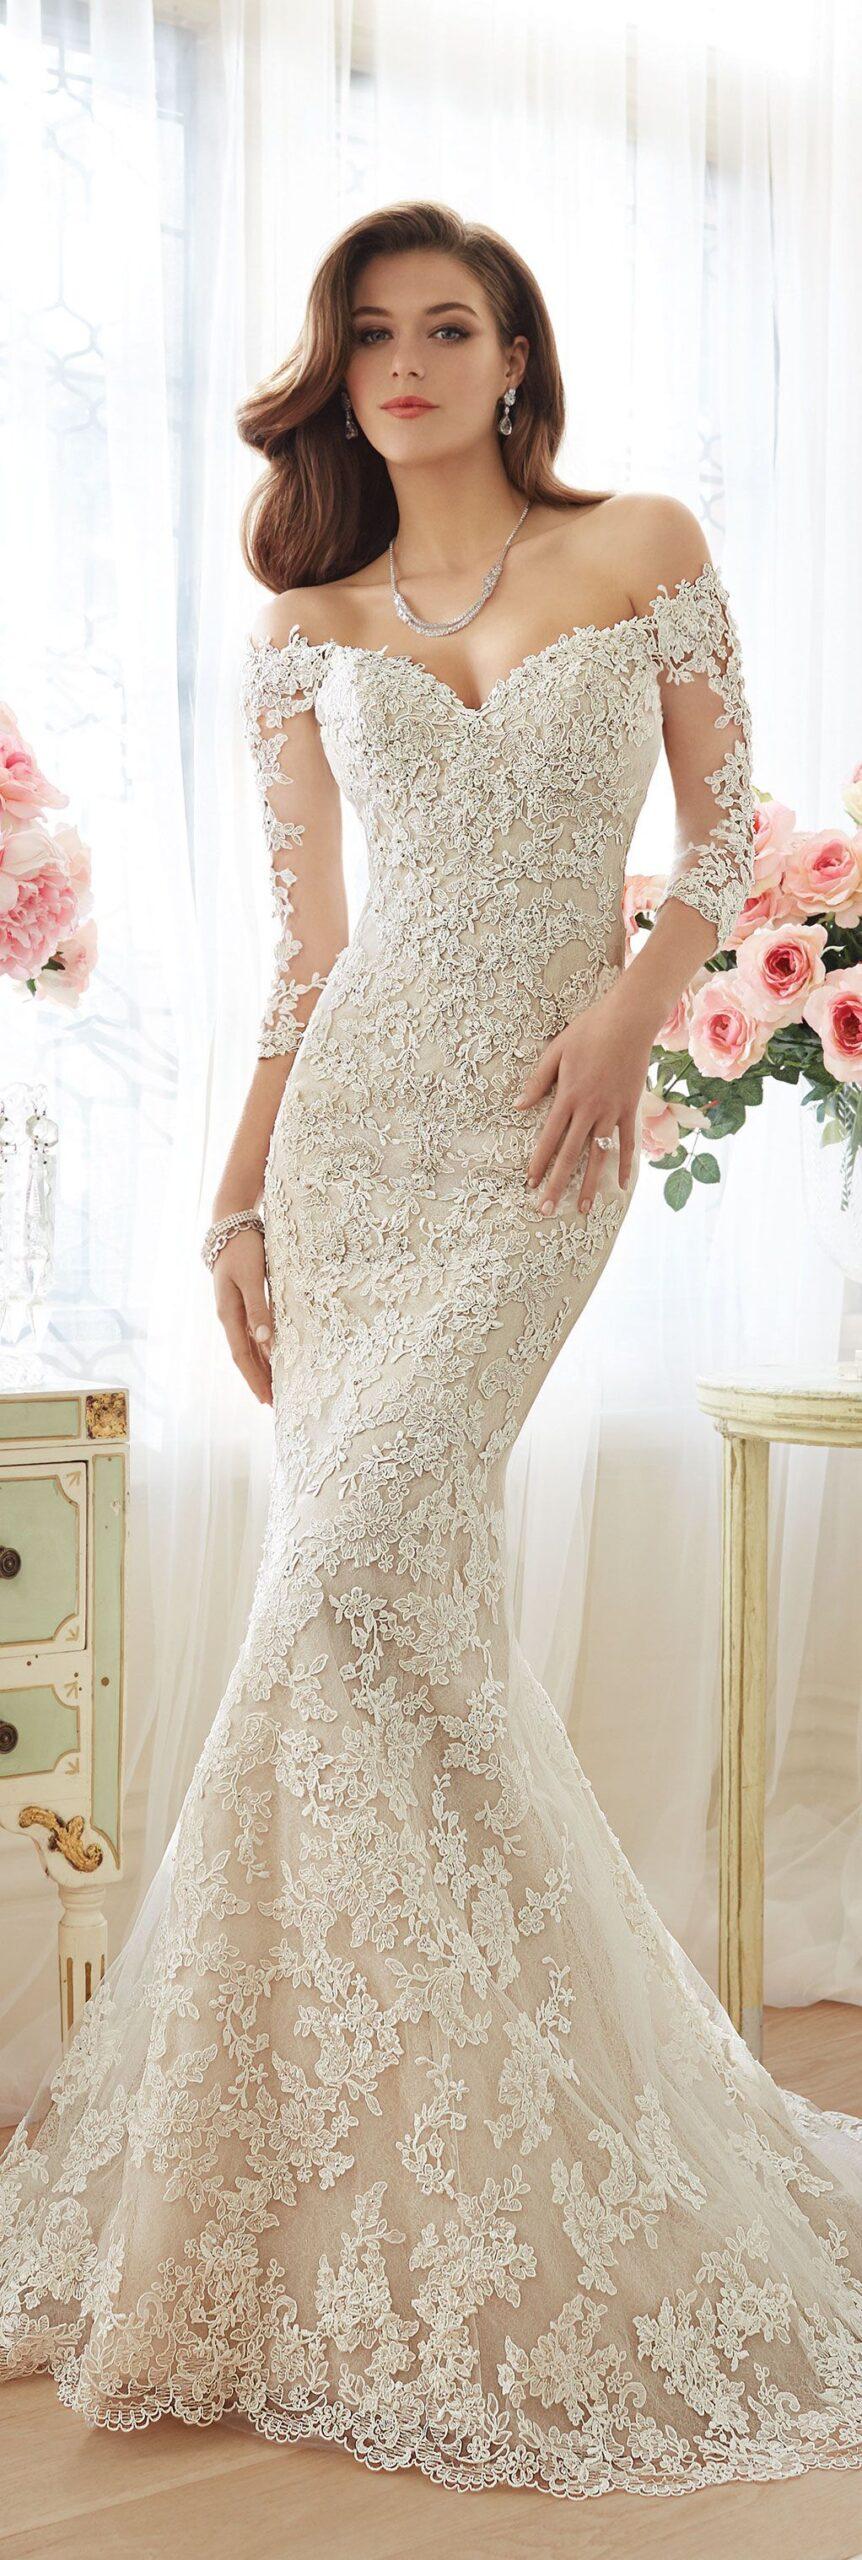 Wedding-Dresses-1666